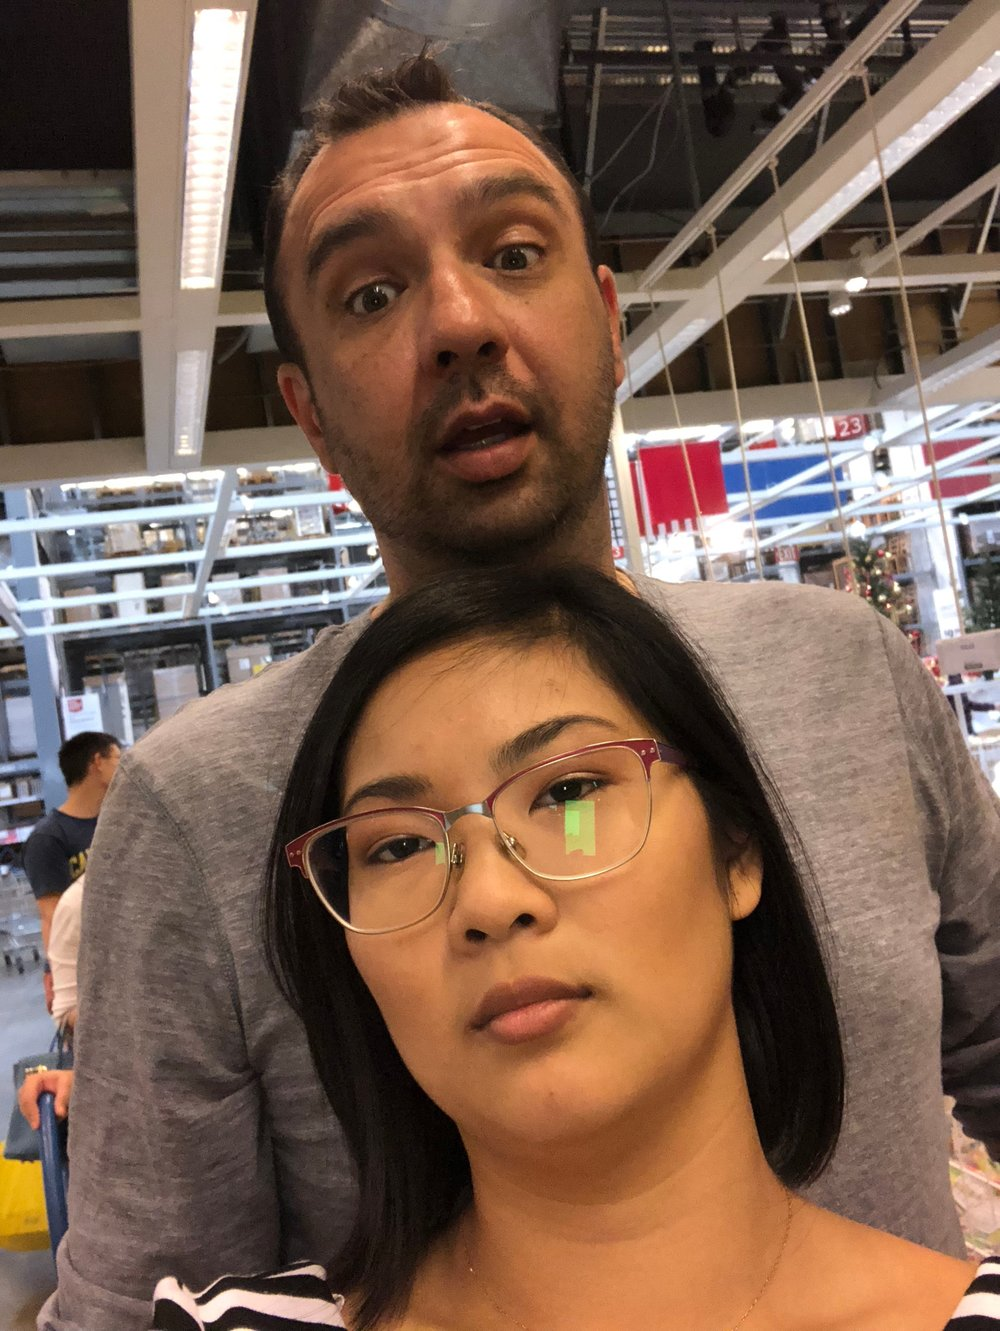 save yourself - avoid Palo Alto IKEA